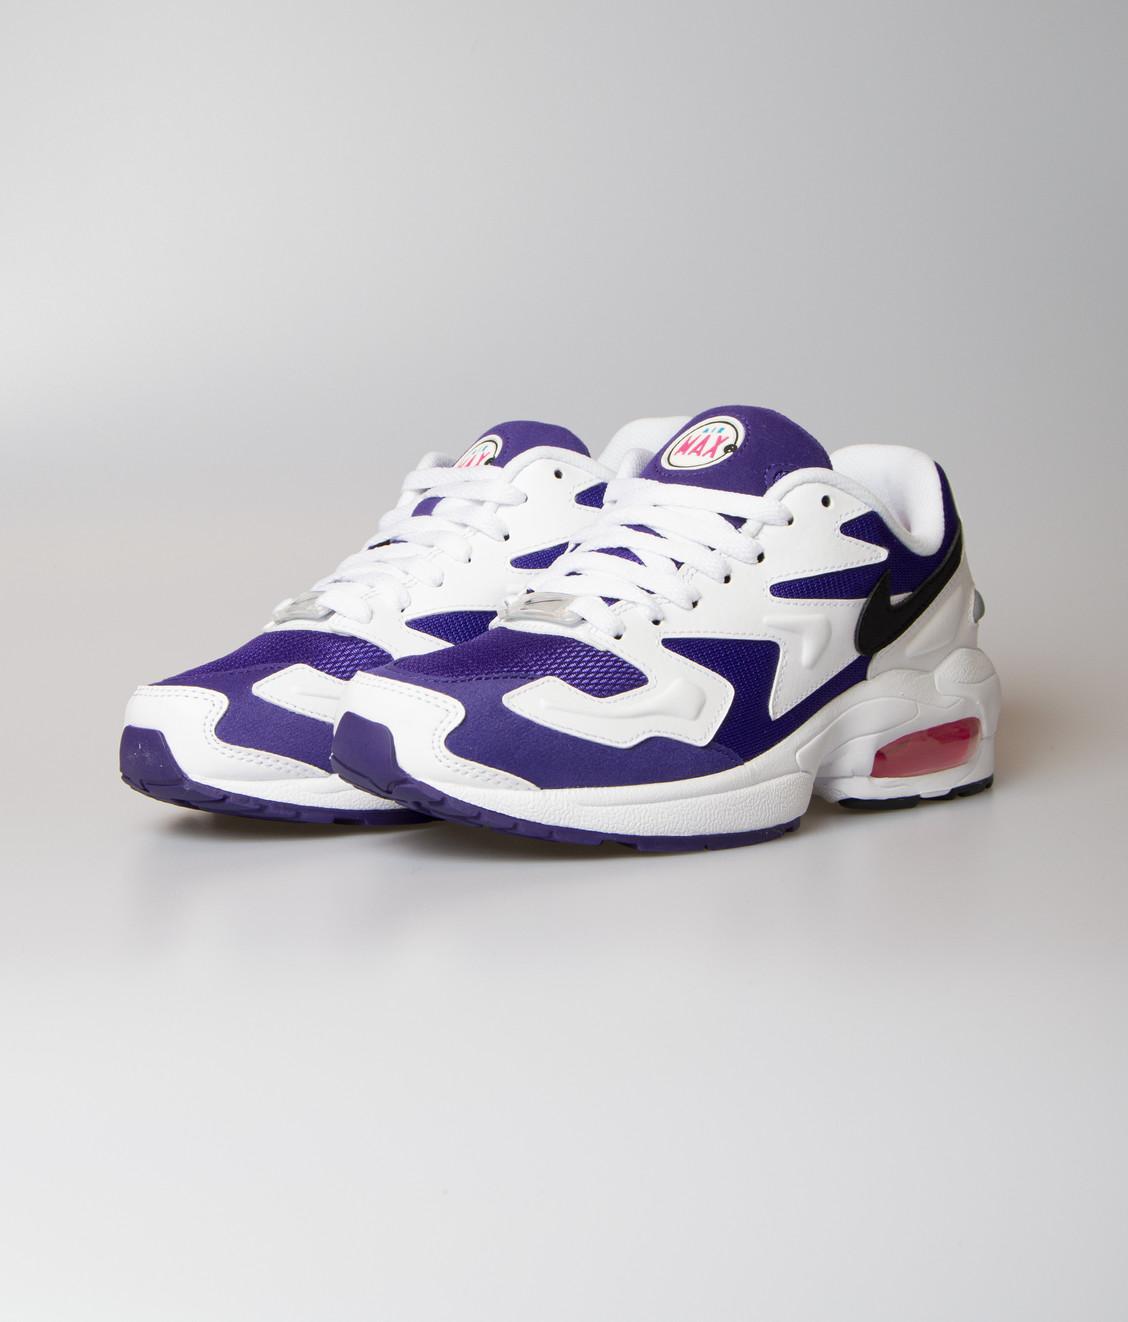 Nike Nike Air Max 2 Light White Court Purple